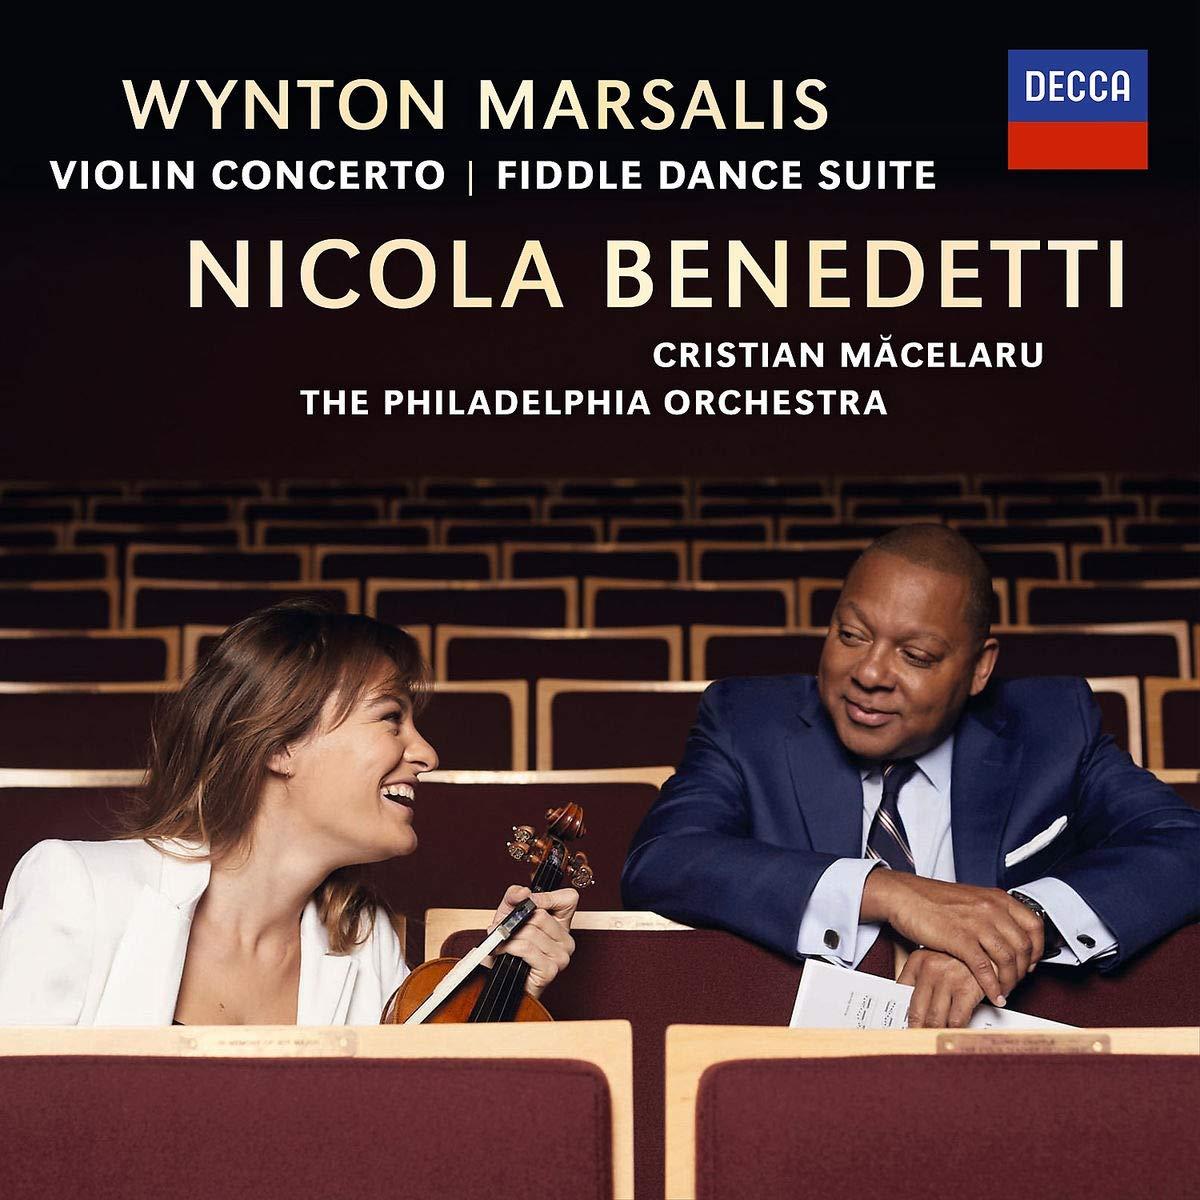 Никола Бенедетти,Уинтон Марсалис Nicola Benedetti. Marsalis: Violin Concerto / Fiddle Dance Suite m dubourg violin concerto in d major